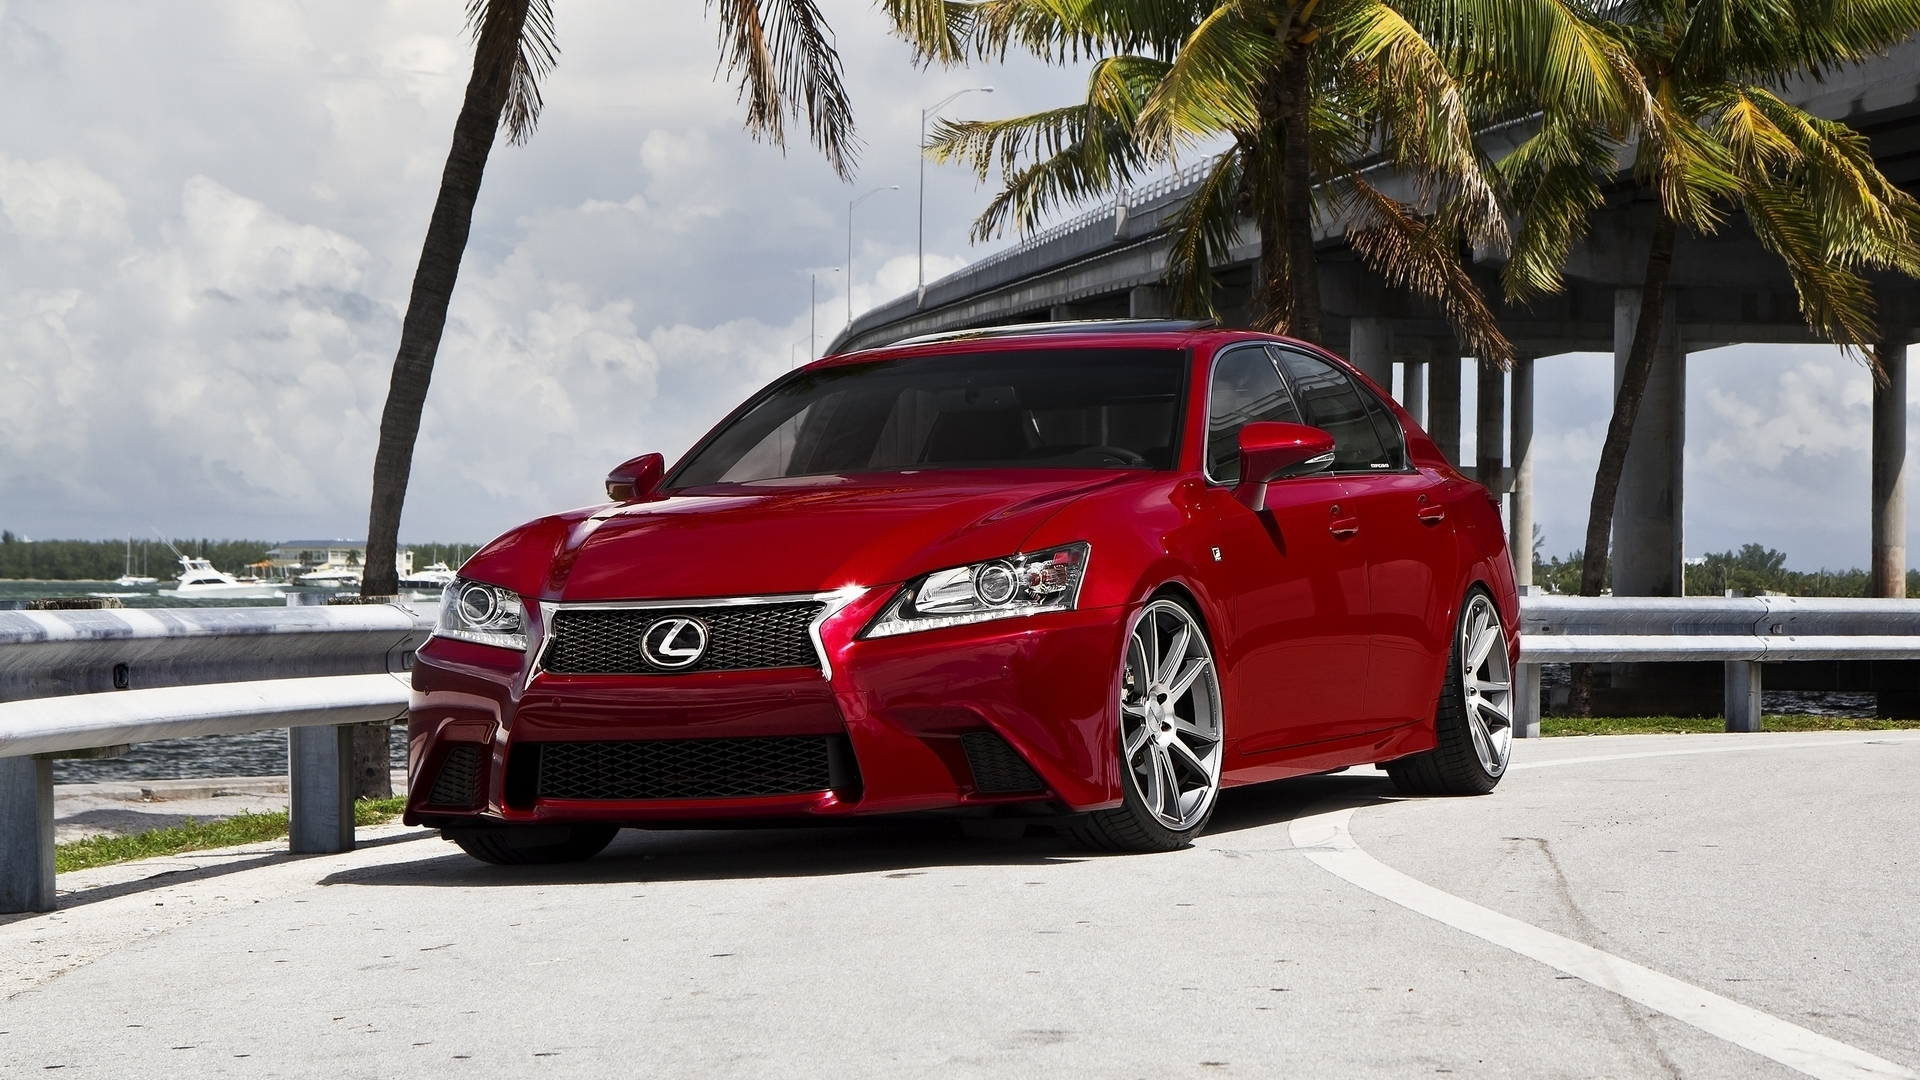 Red Modified Lexus Car Hd Wallpaper